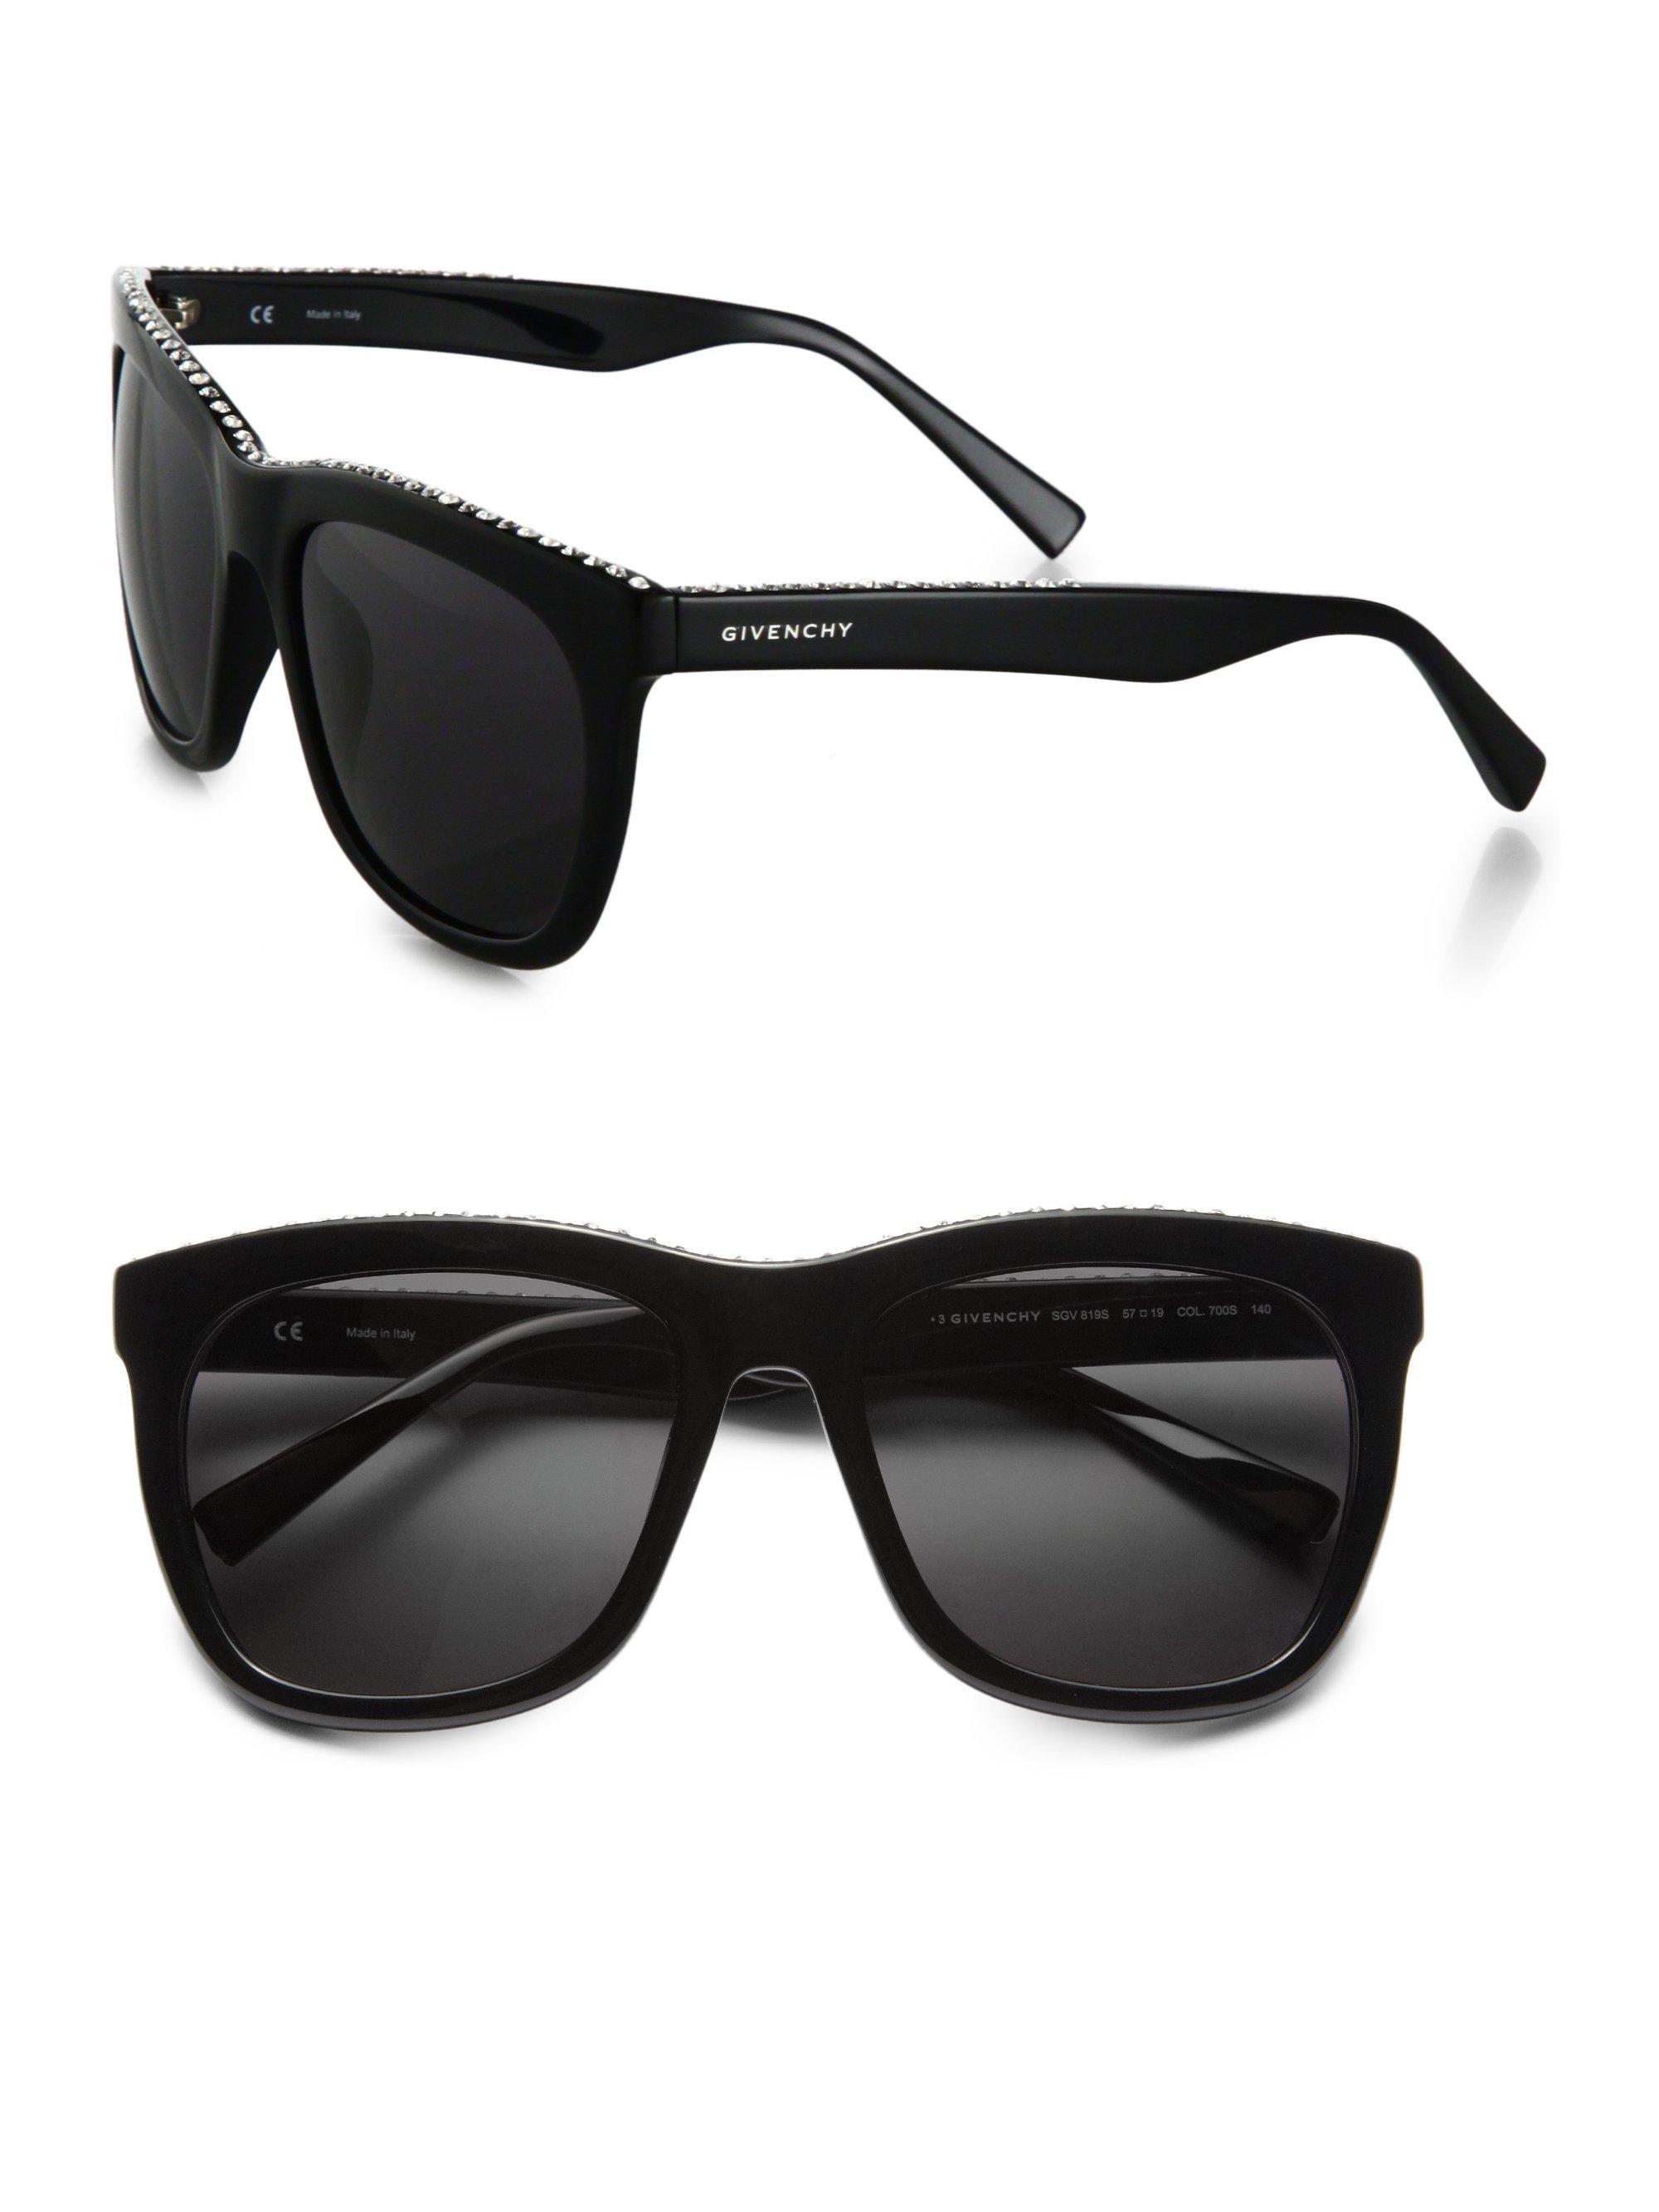 a1a29b8525eb Givenchy Swarovski Crystal Studded Square Sunglasses in Black - Lyst